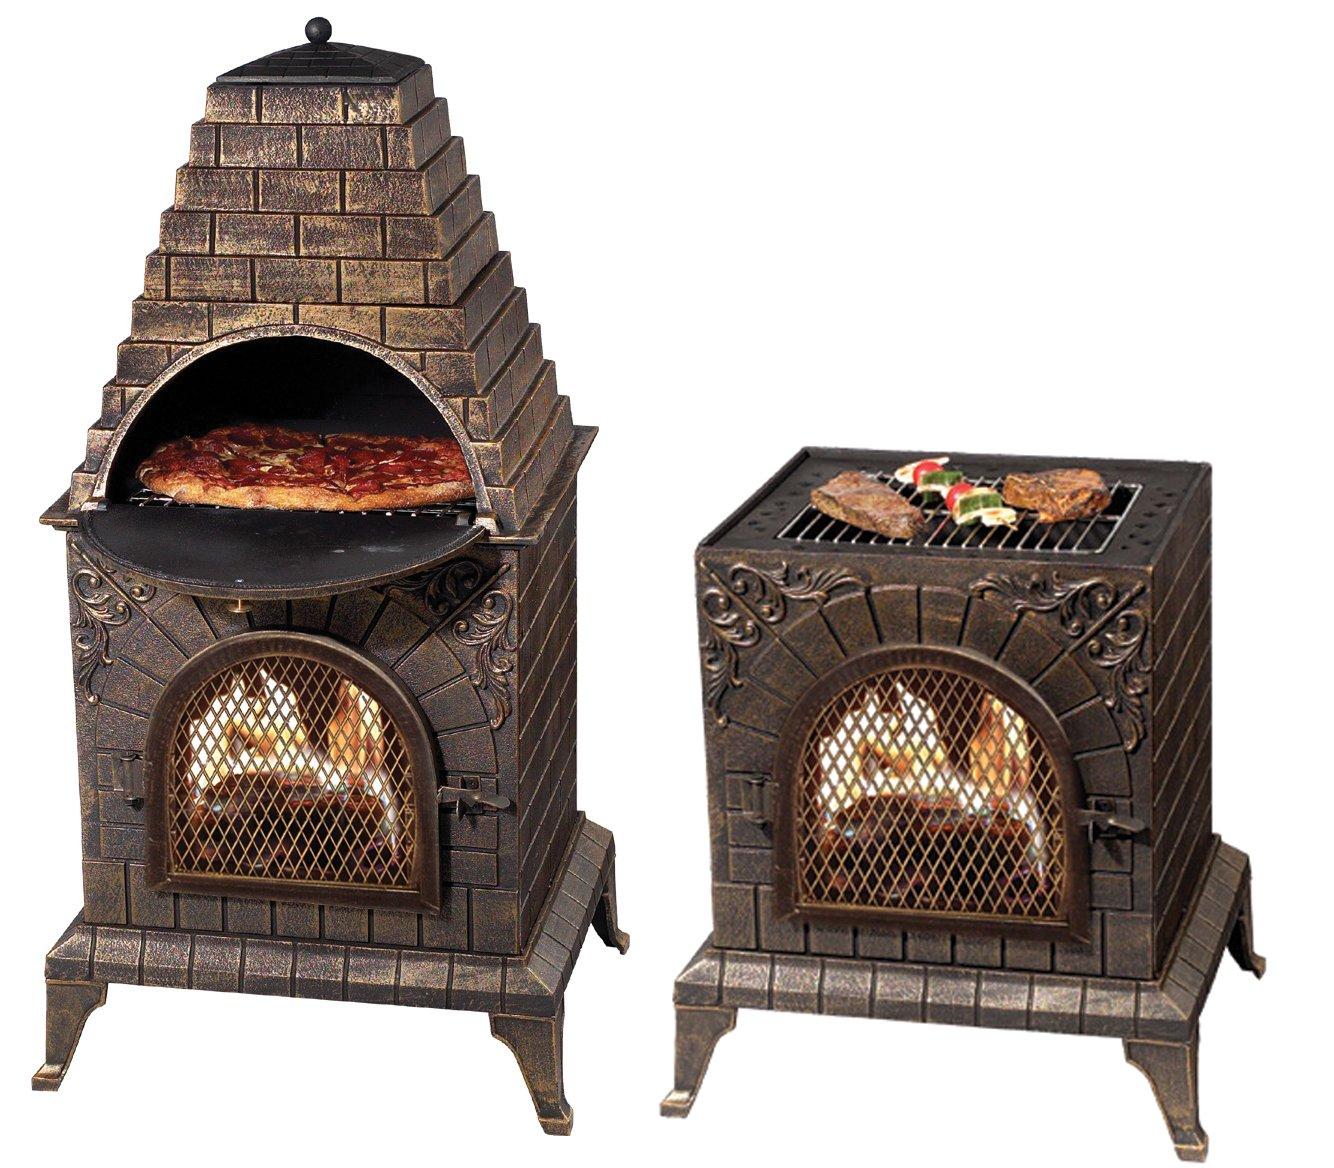 Deeco DM 0039 IA C Aztec Allure Cast Iron Pizza Oven Chiminea Product